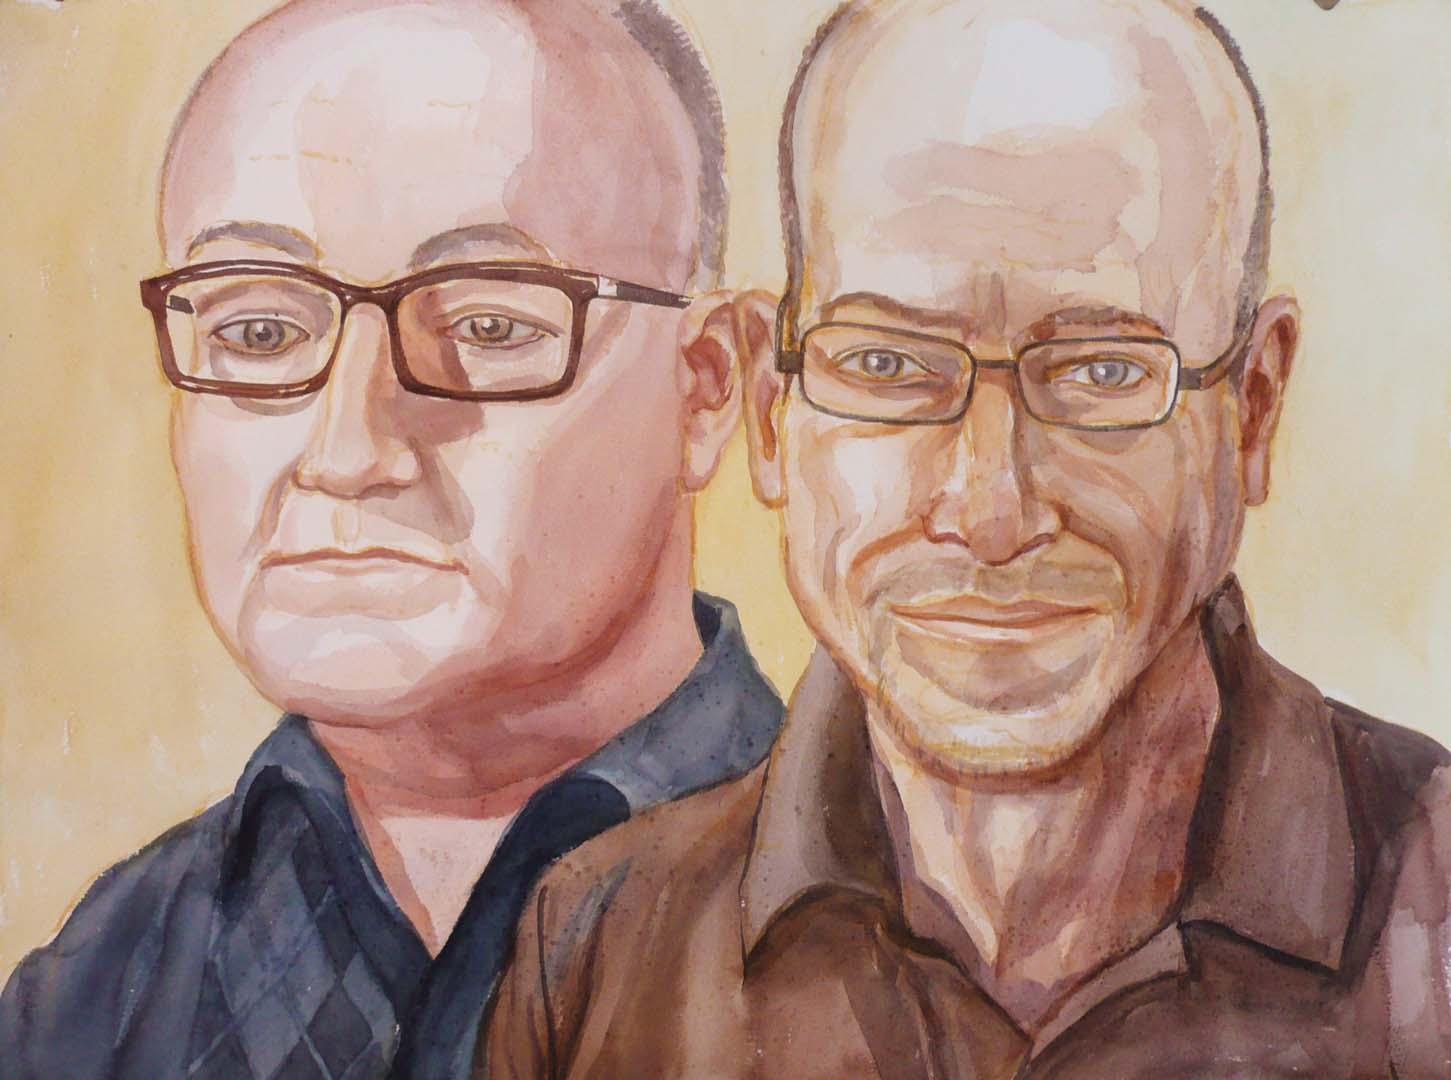 2008 Ira Helf & John Knoebel Watercolor Dimensions Unknown